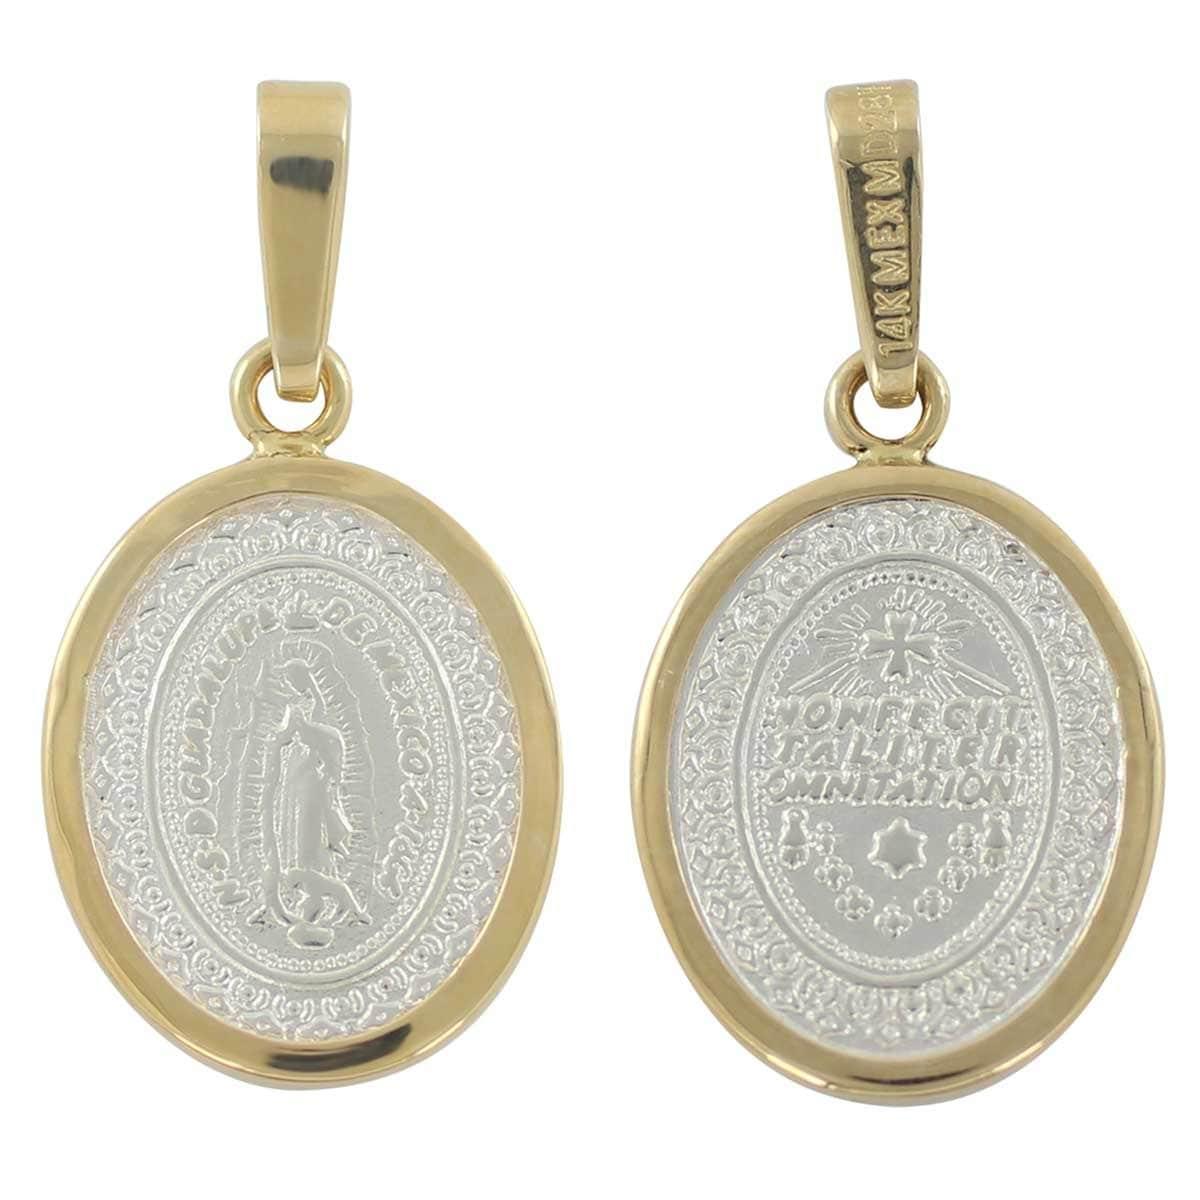 5d805f3f43e0 Medalla virgen de guadalupe con bisel de 14k villalpando